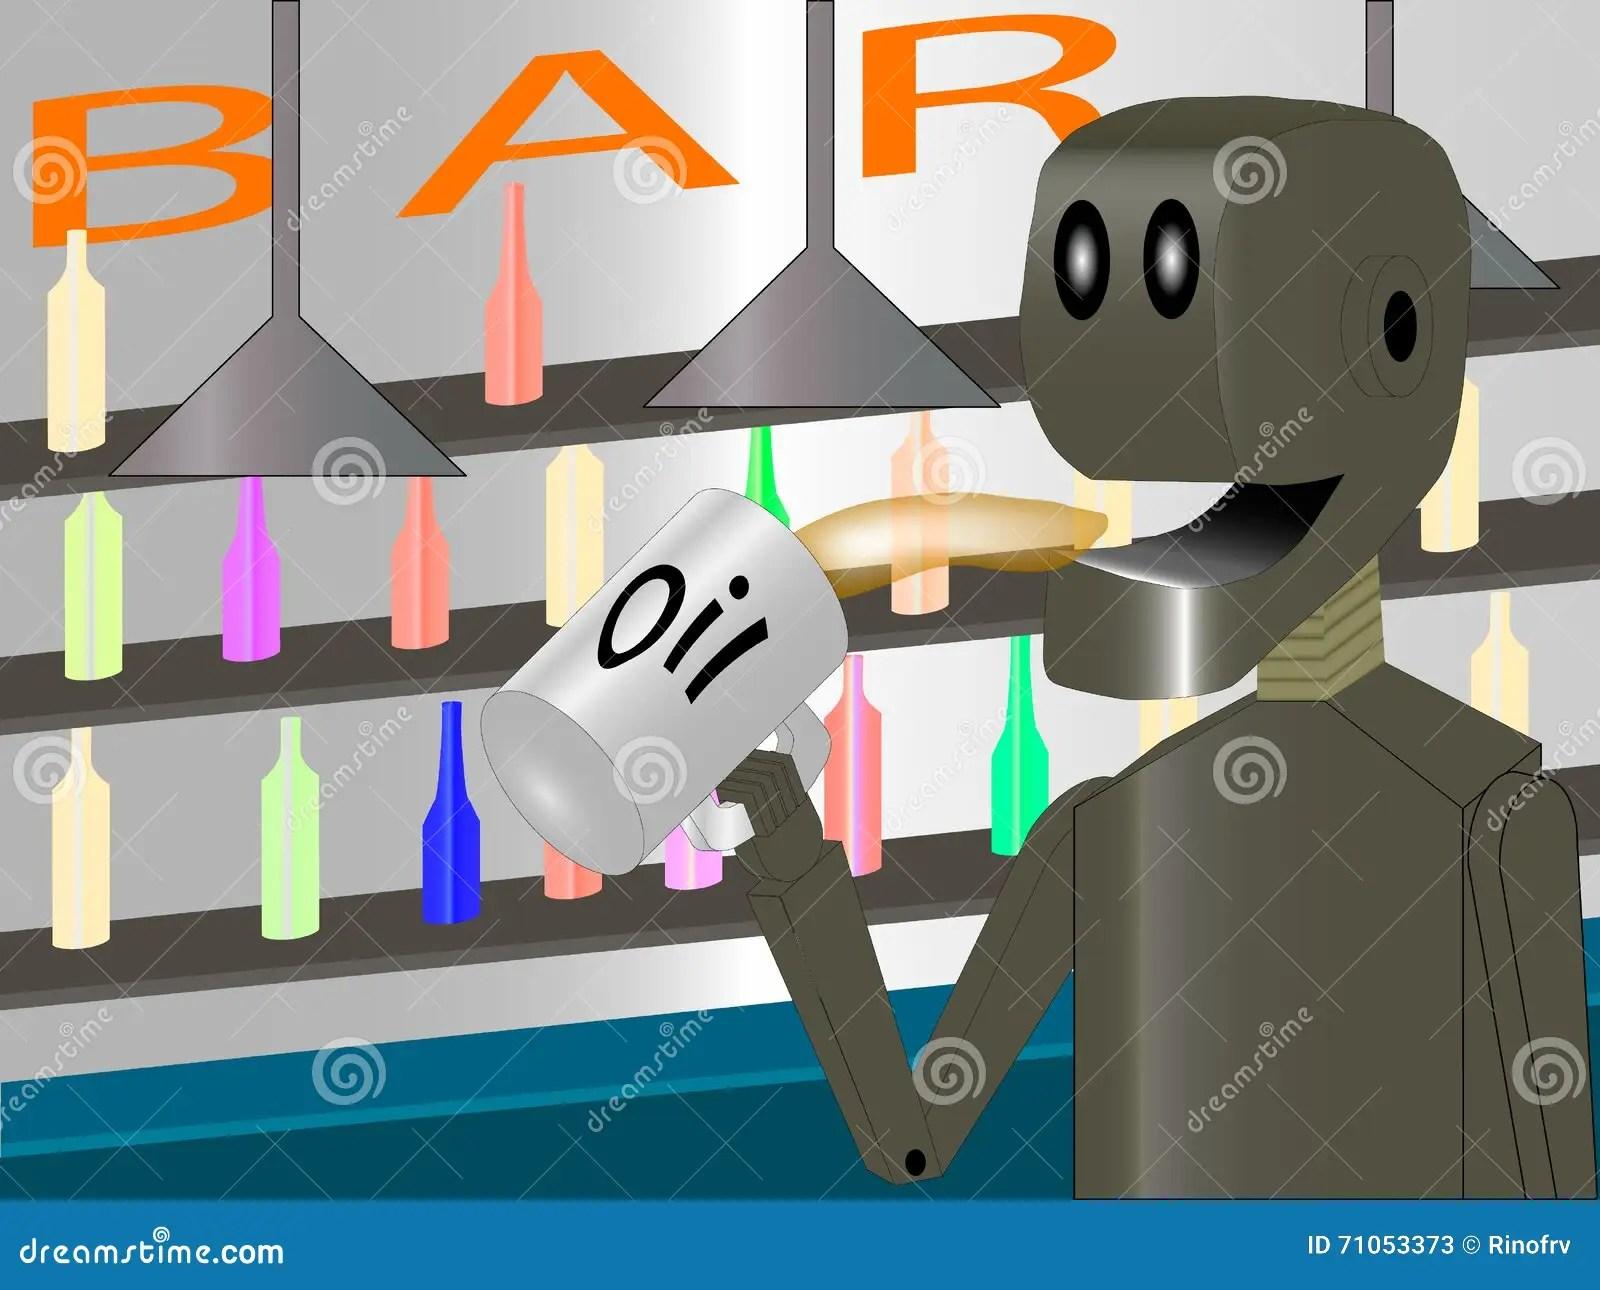 robot at the bar